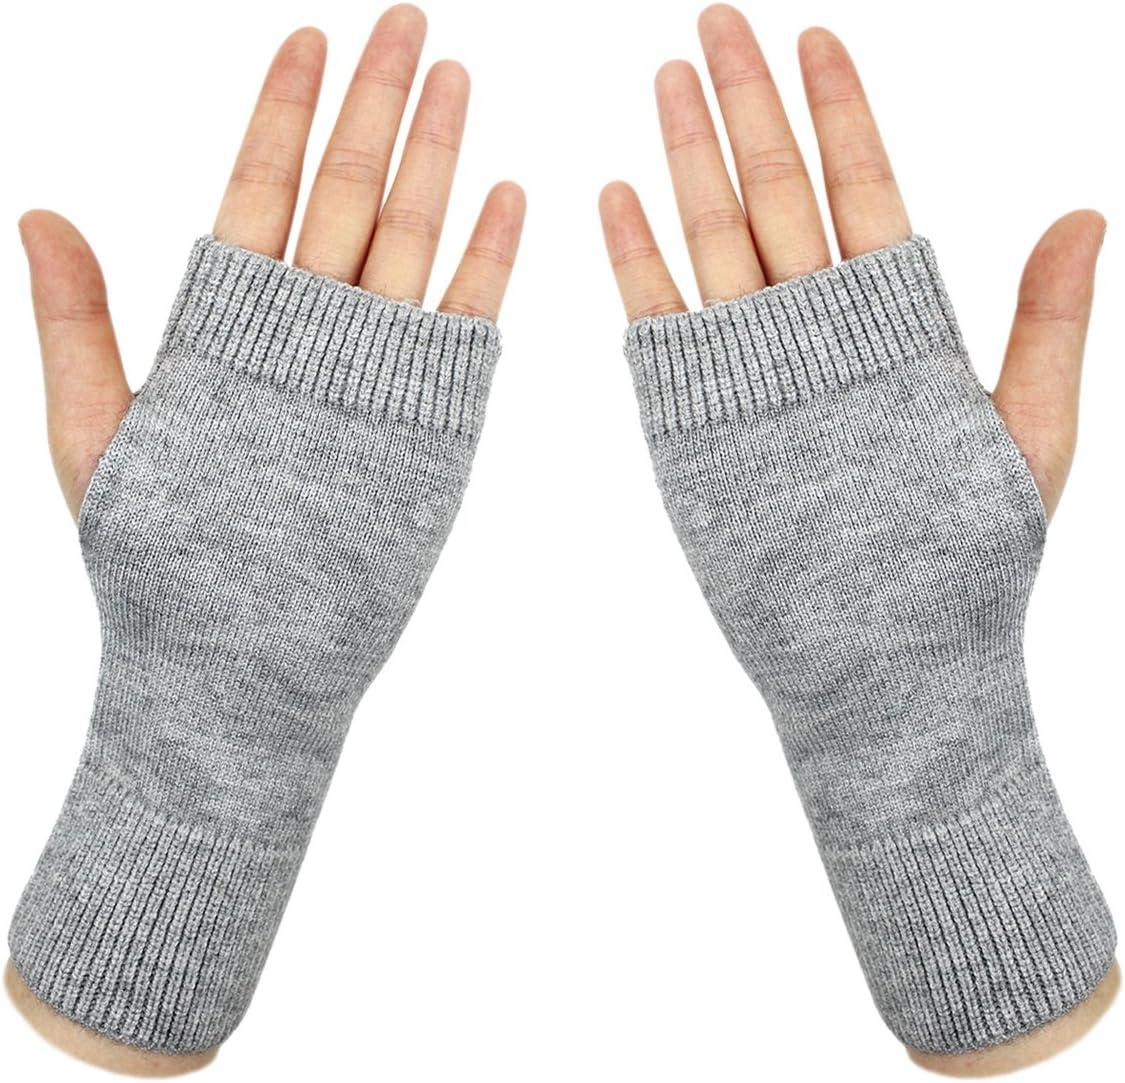 Ai bearty Lightweight Half Fingerless Mittens Thumb Hole Warm Gloves for Women